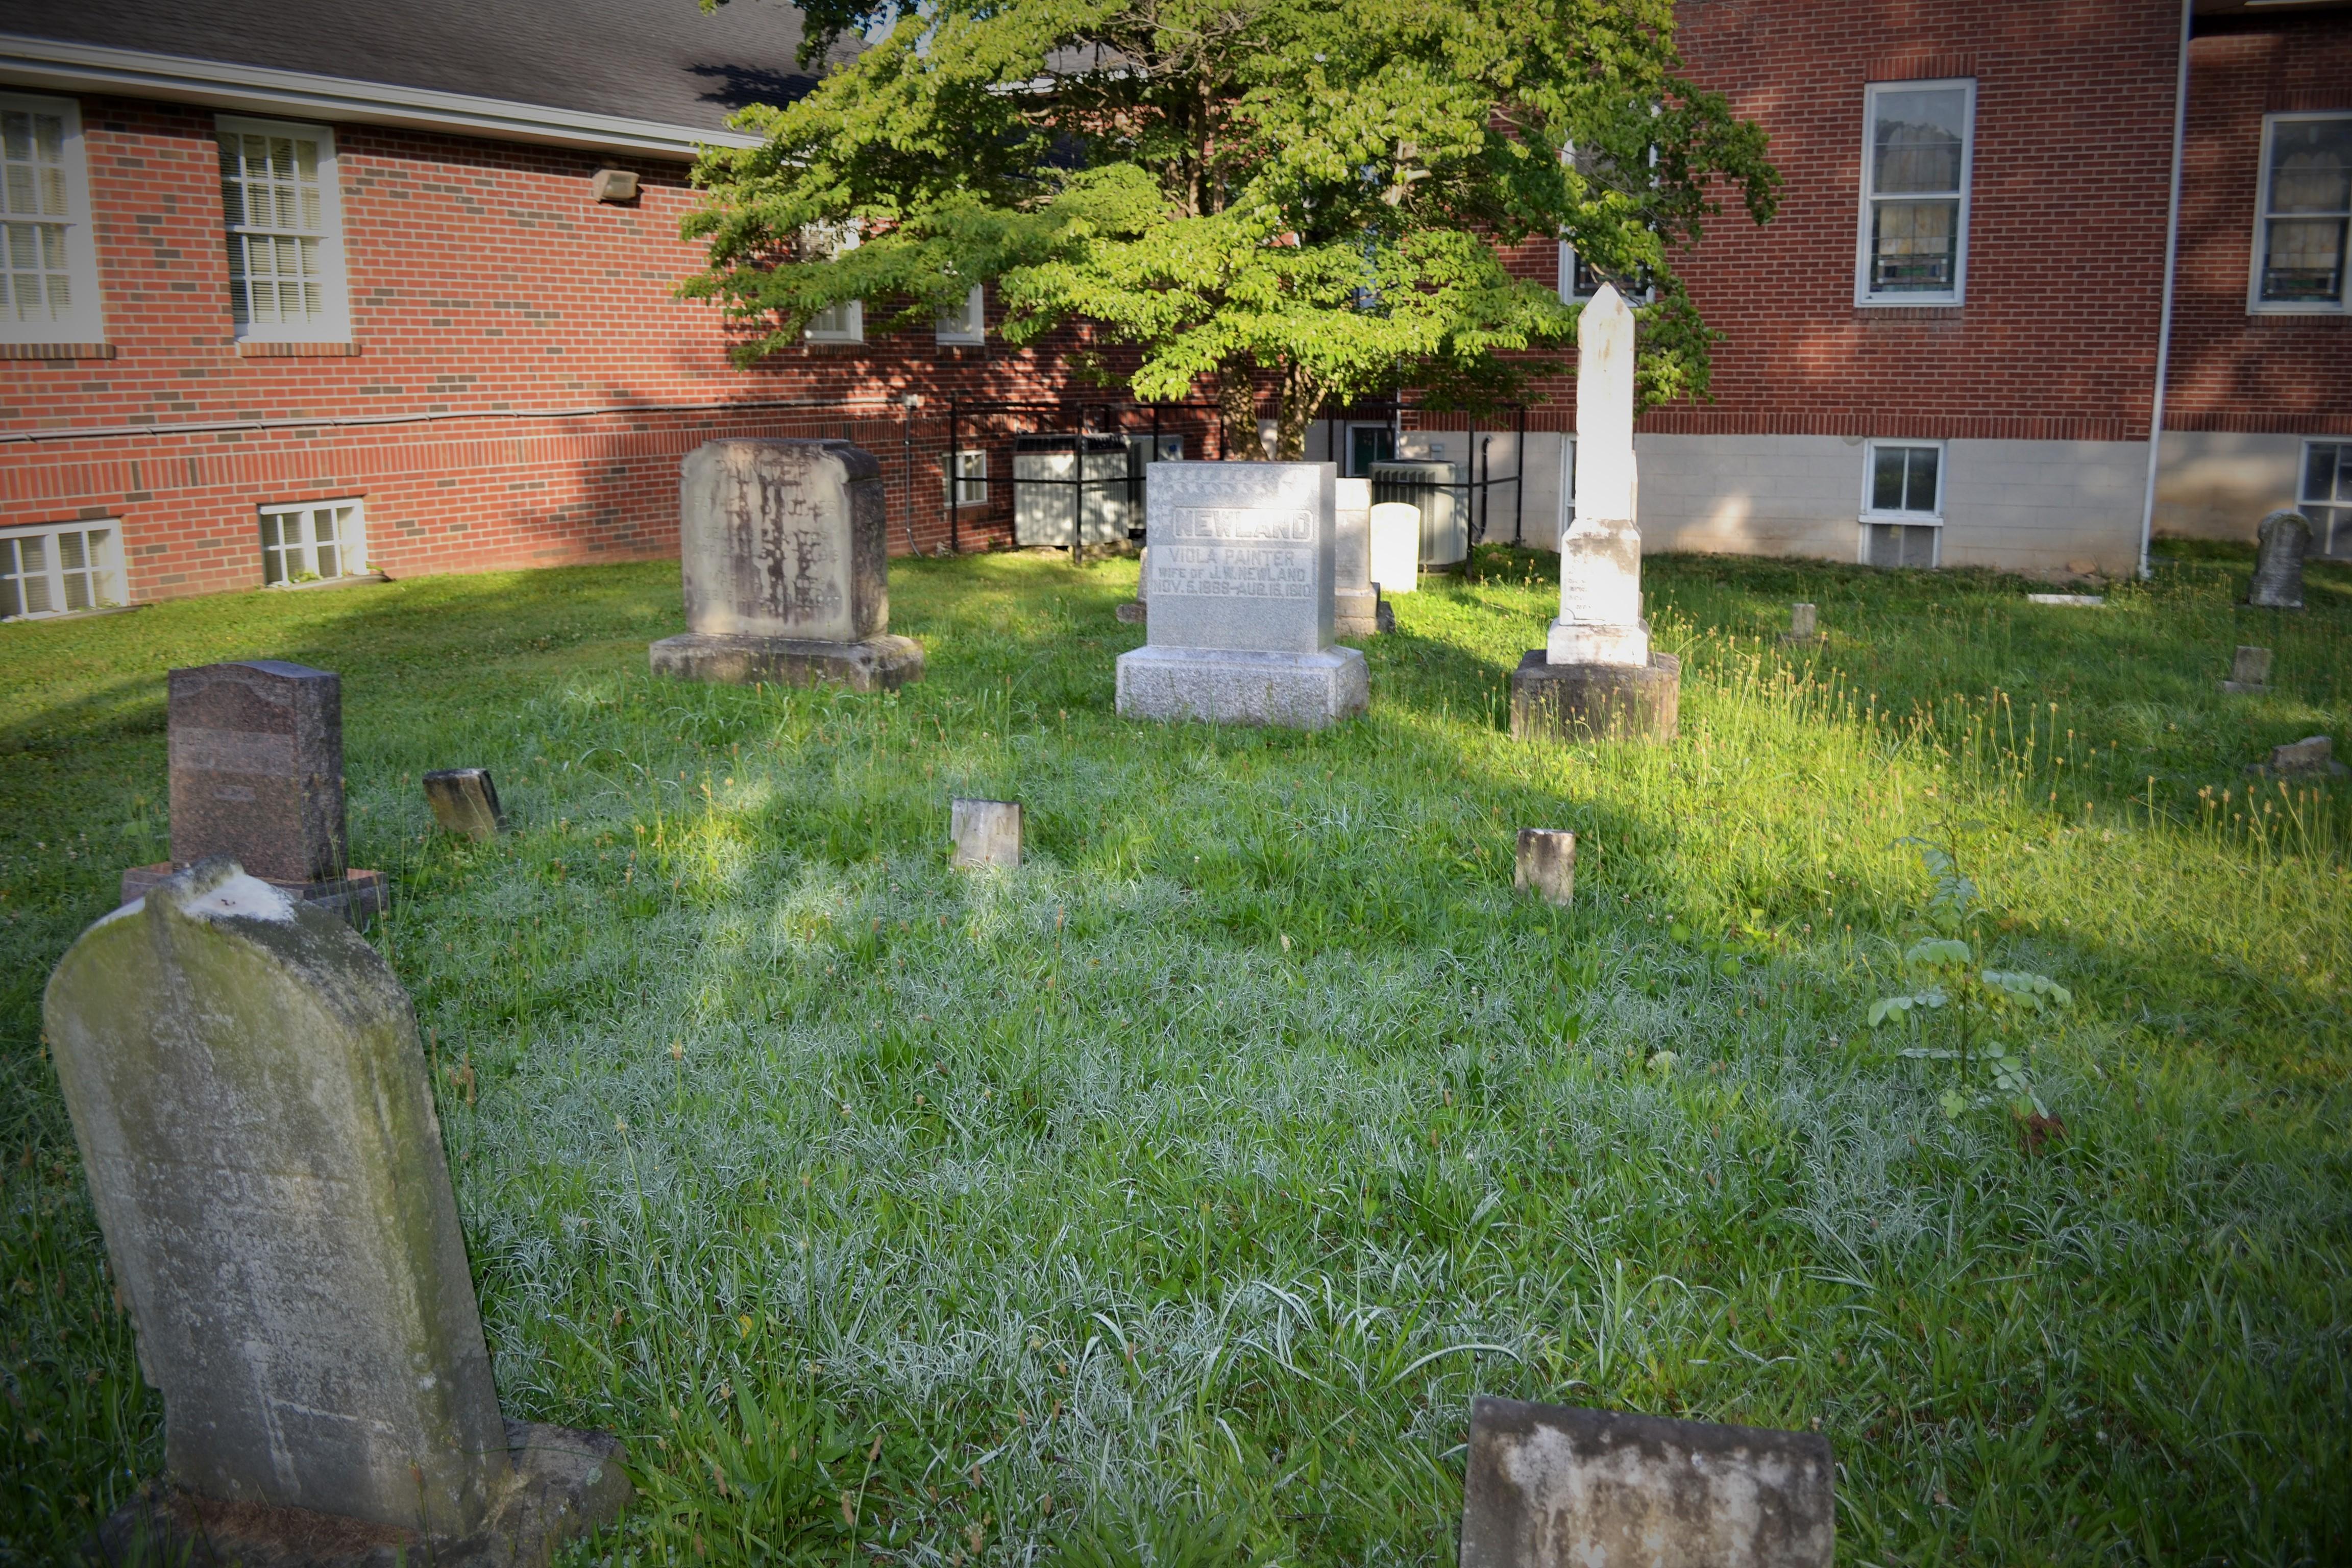 Brodhead Baptist Church Cemetery